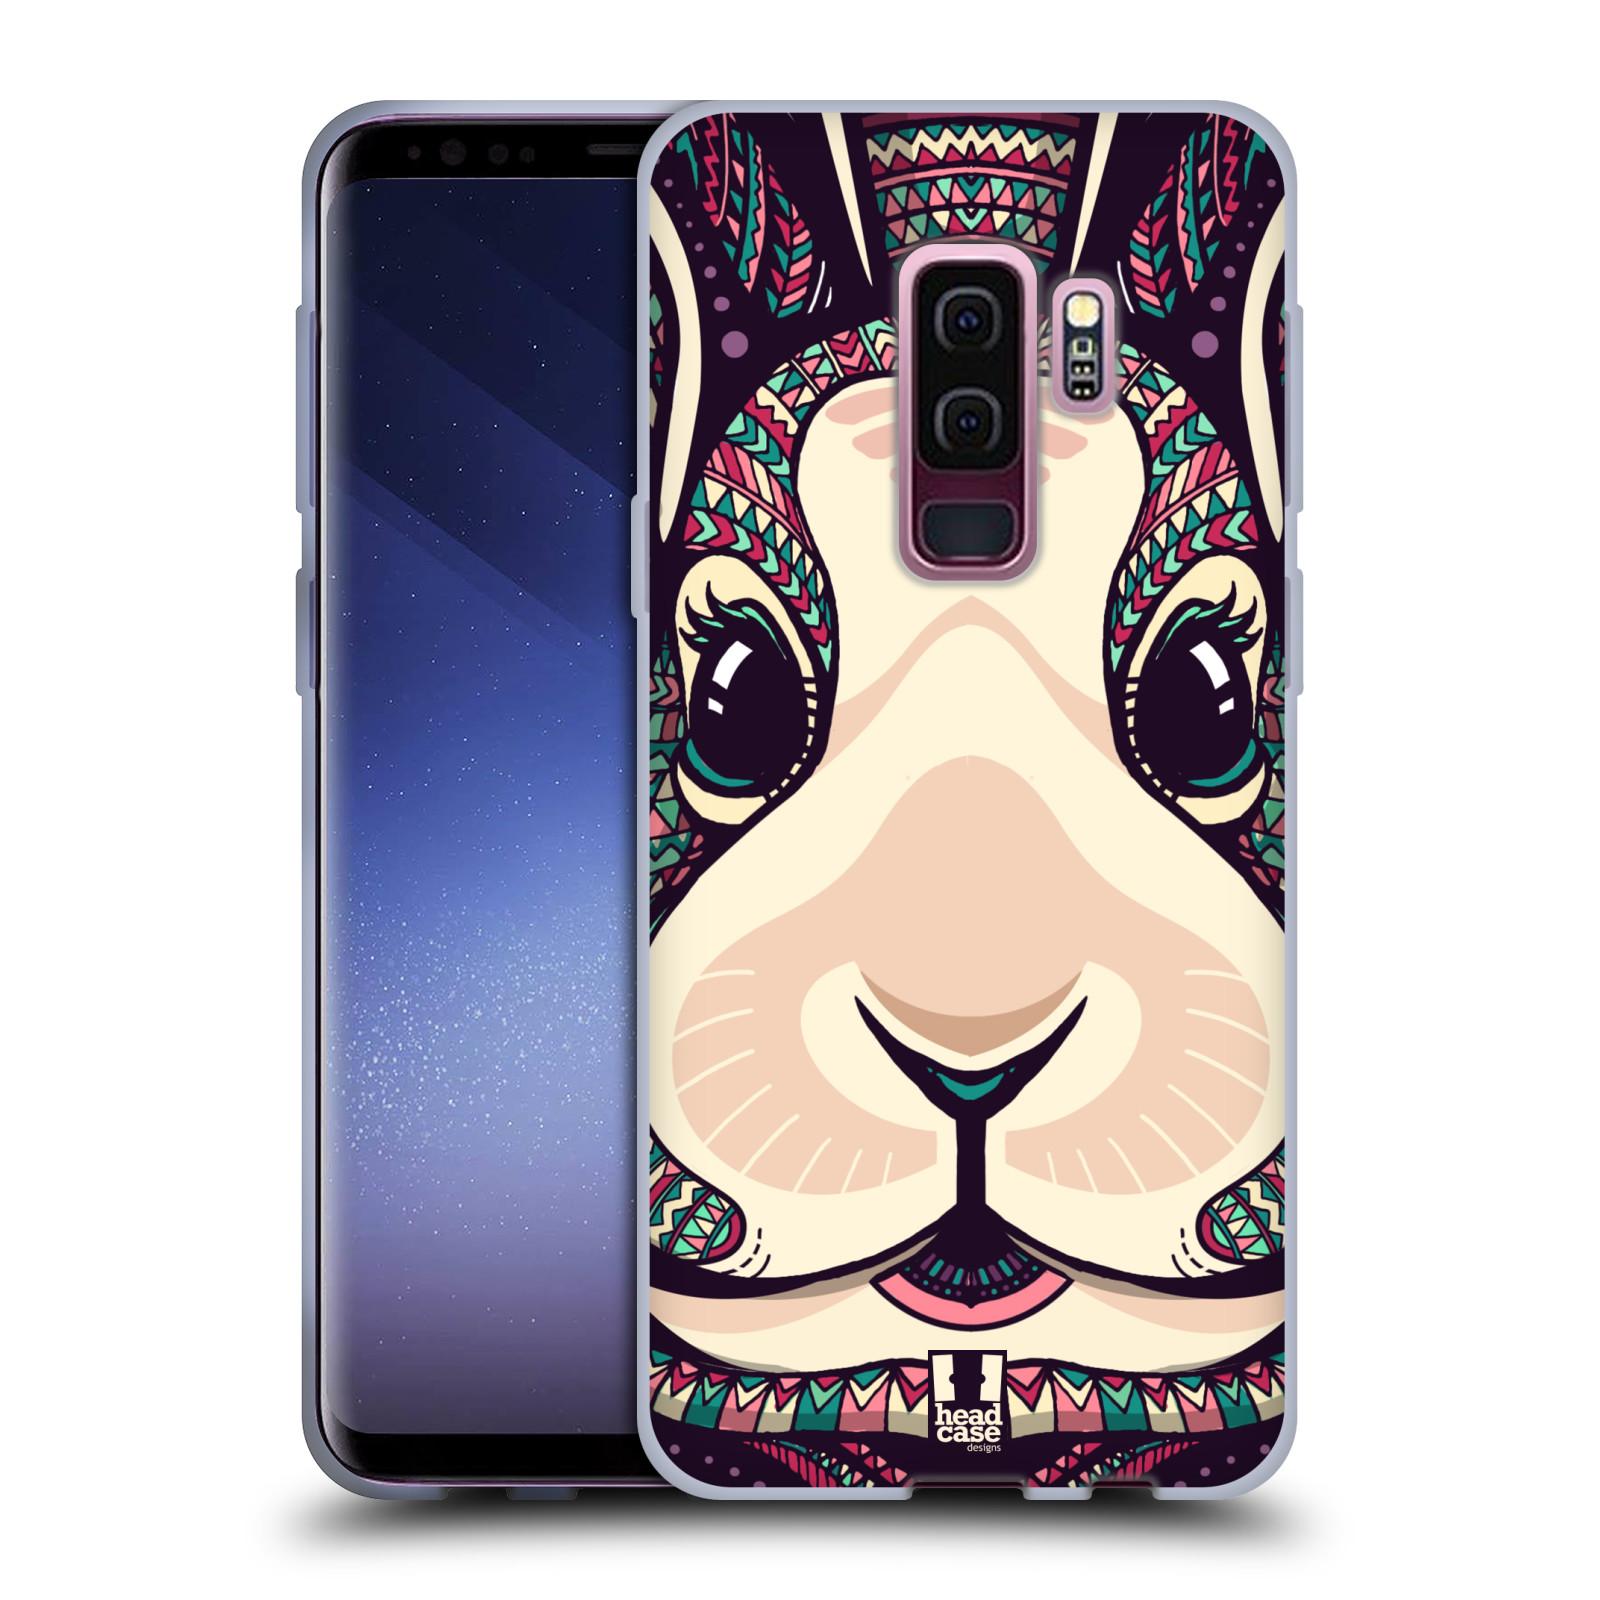 Silikonové pouzdro na mobil Samsung Galaxy S9 Plus - Head Case - AZTEC ZAJÍČEK